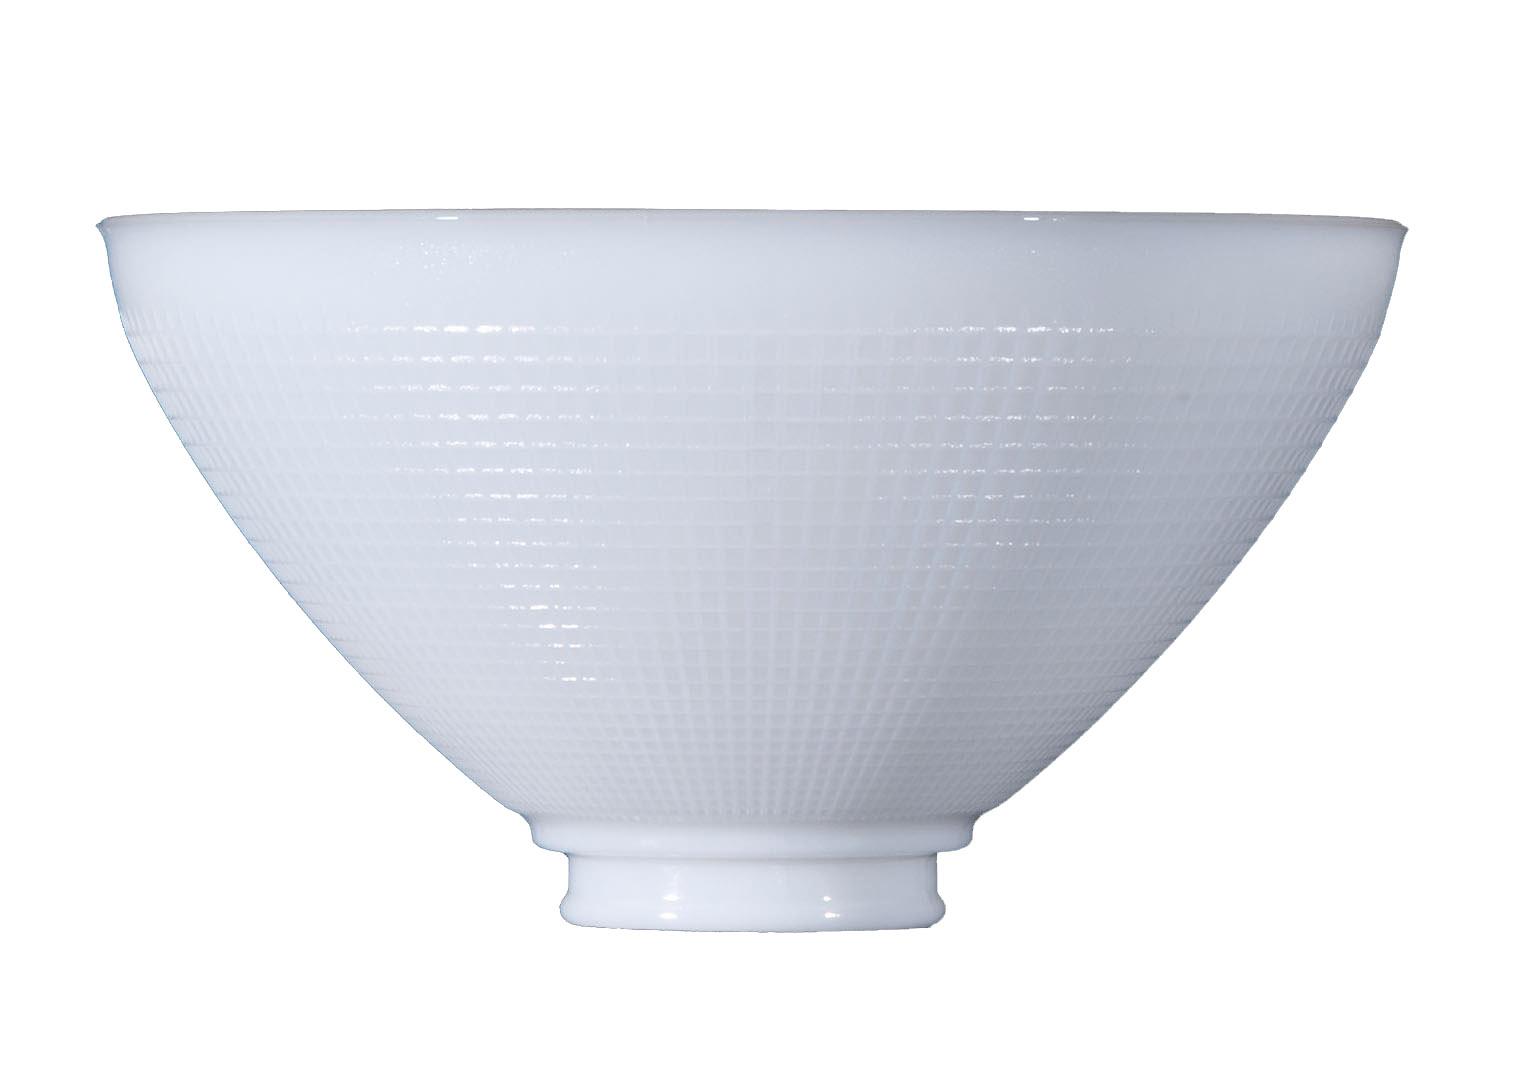 10 I E S Opal Glass Reflector Shade 08392 B Amp P Lamp Supply